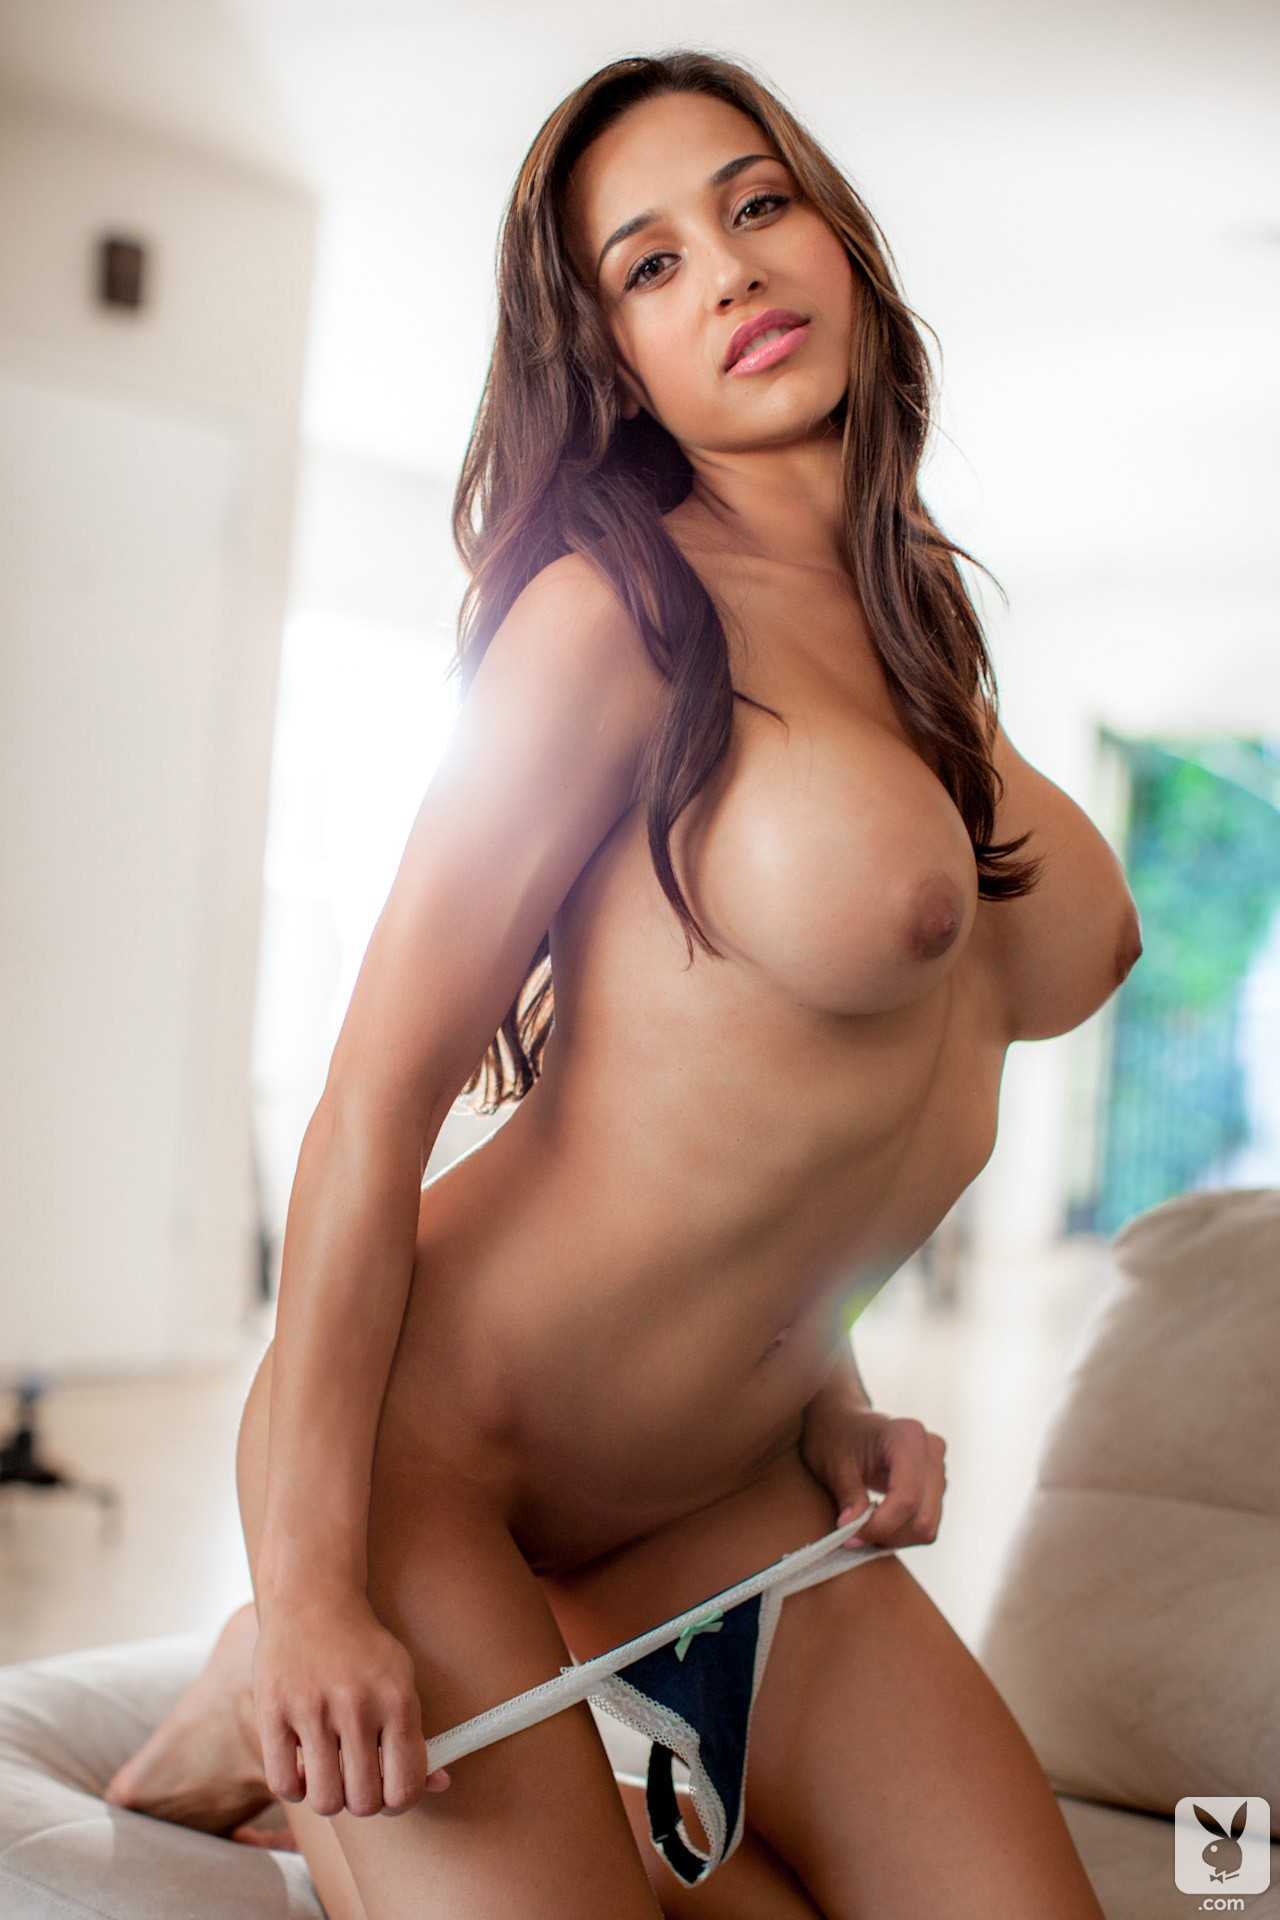 Ana Cheri Nude Video ana cheri - page 6 pictures, naked, oops, topless, bikini